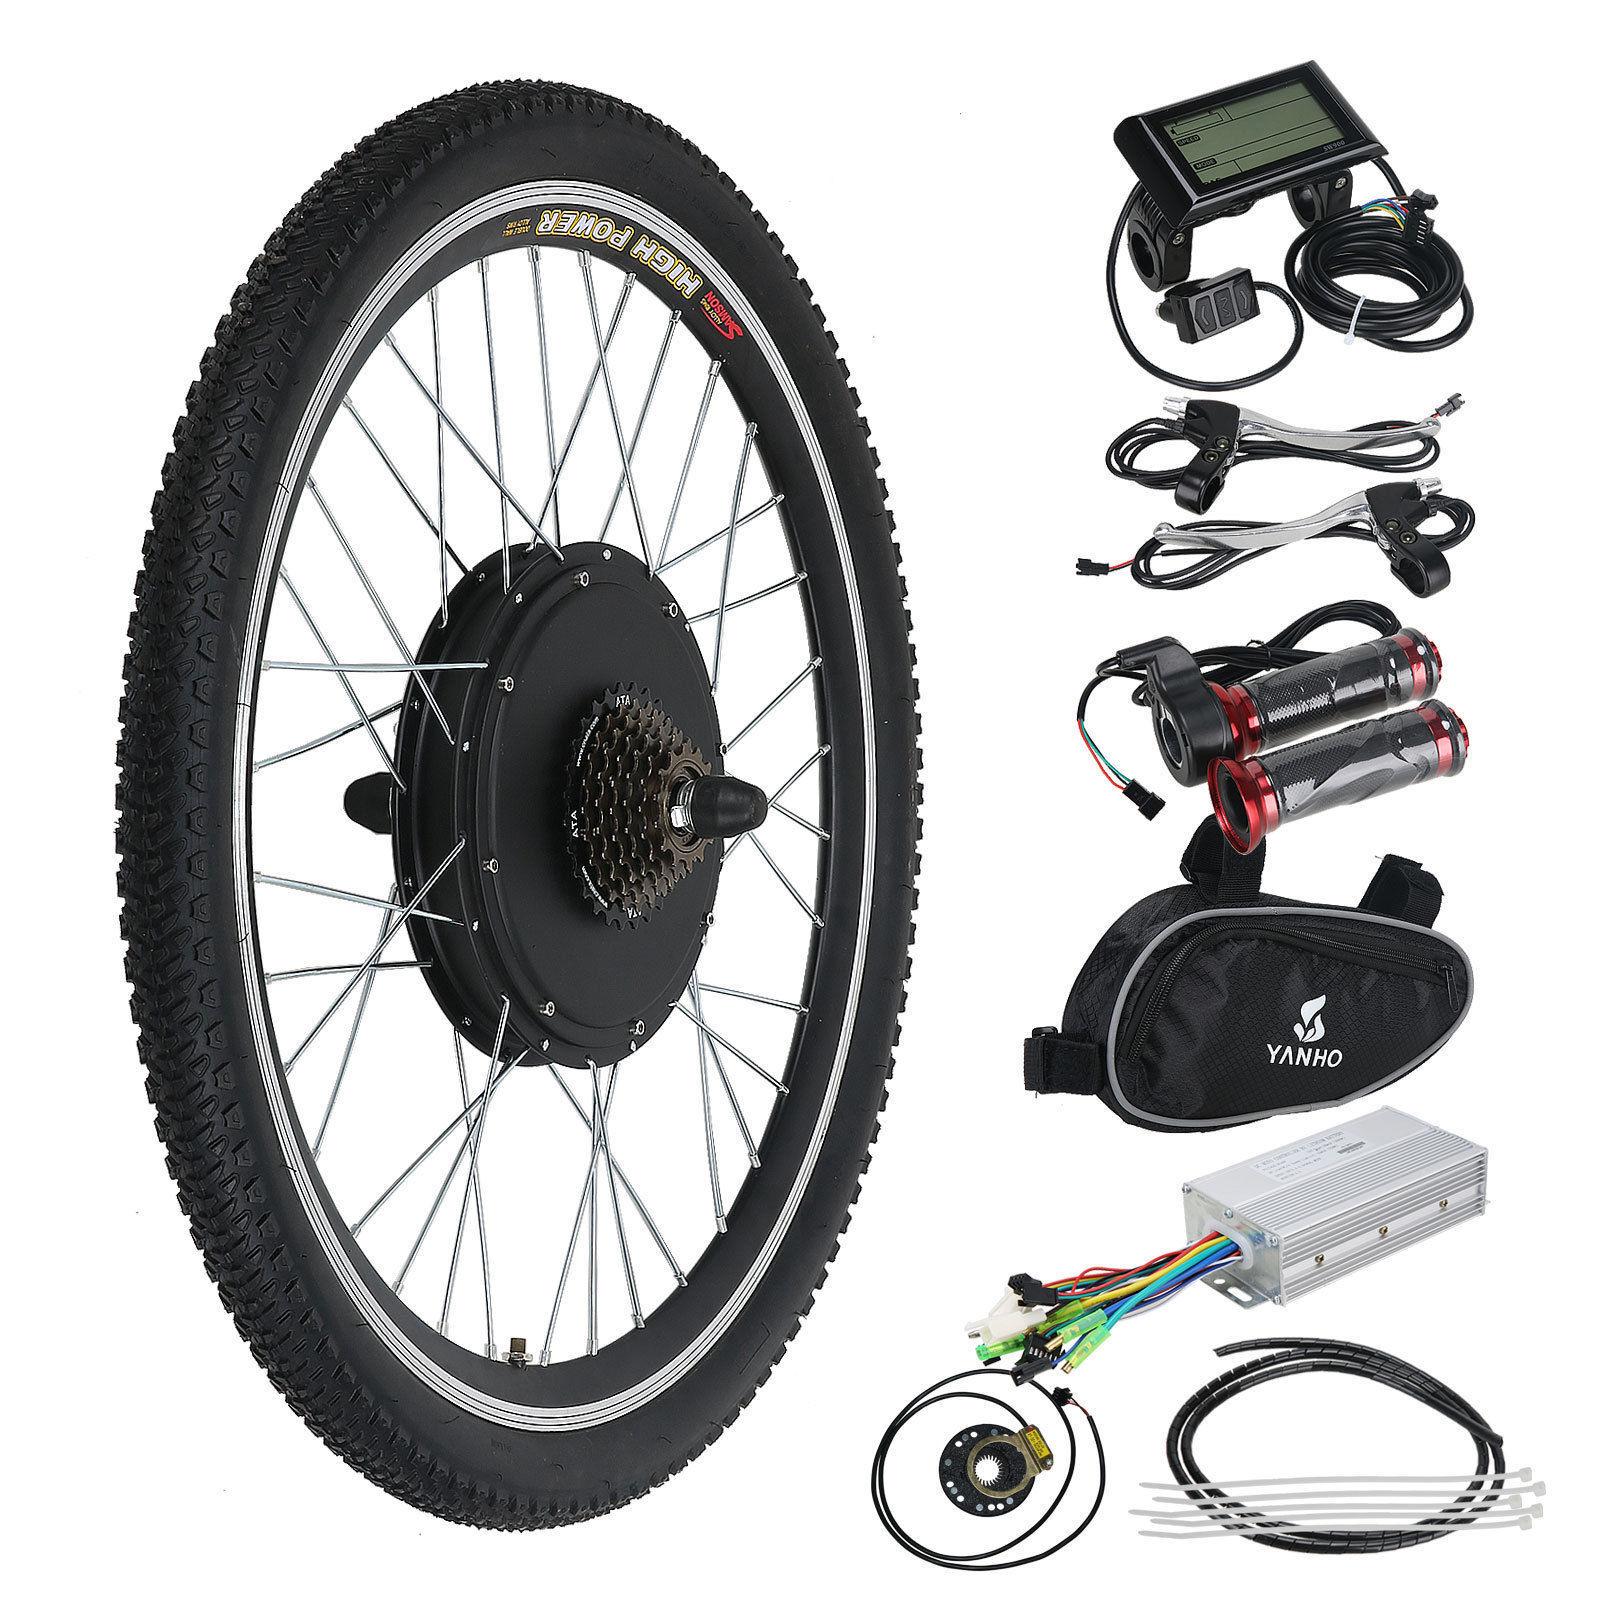 750 W Electric Bikes For Sale Ebay Custom Waterproof Bike Wiring Harness 48v Rear Wheel Bicycle E Motor Conversion Kit 1000w Hub Lcd Meter